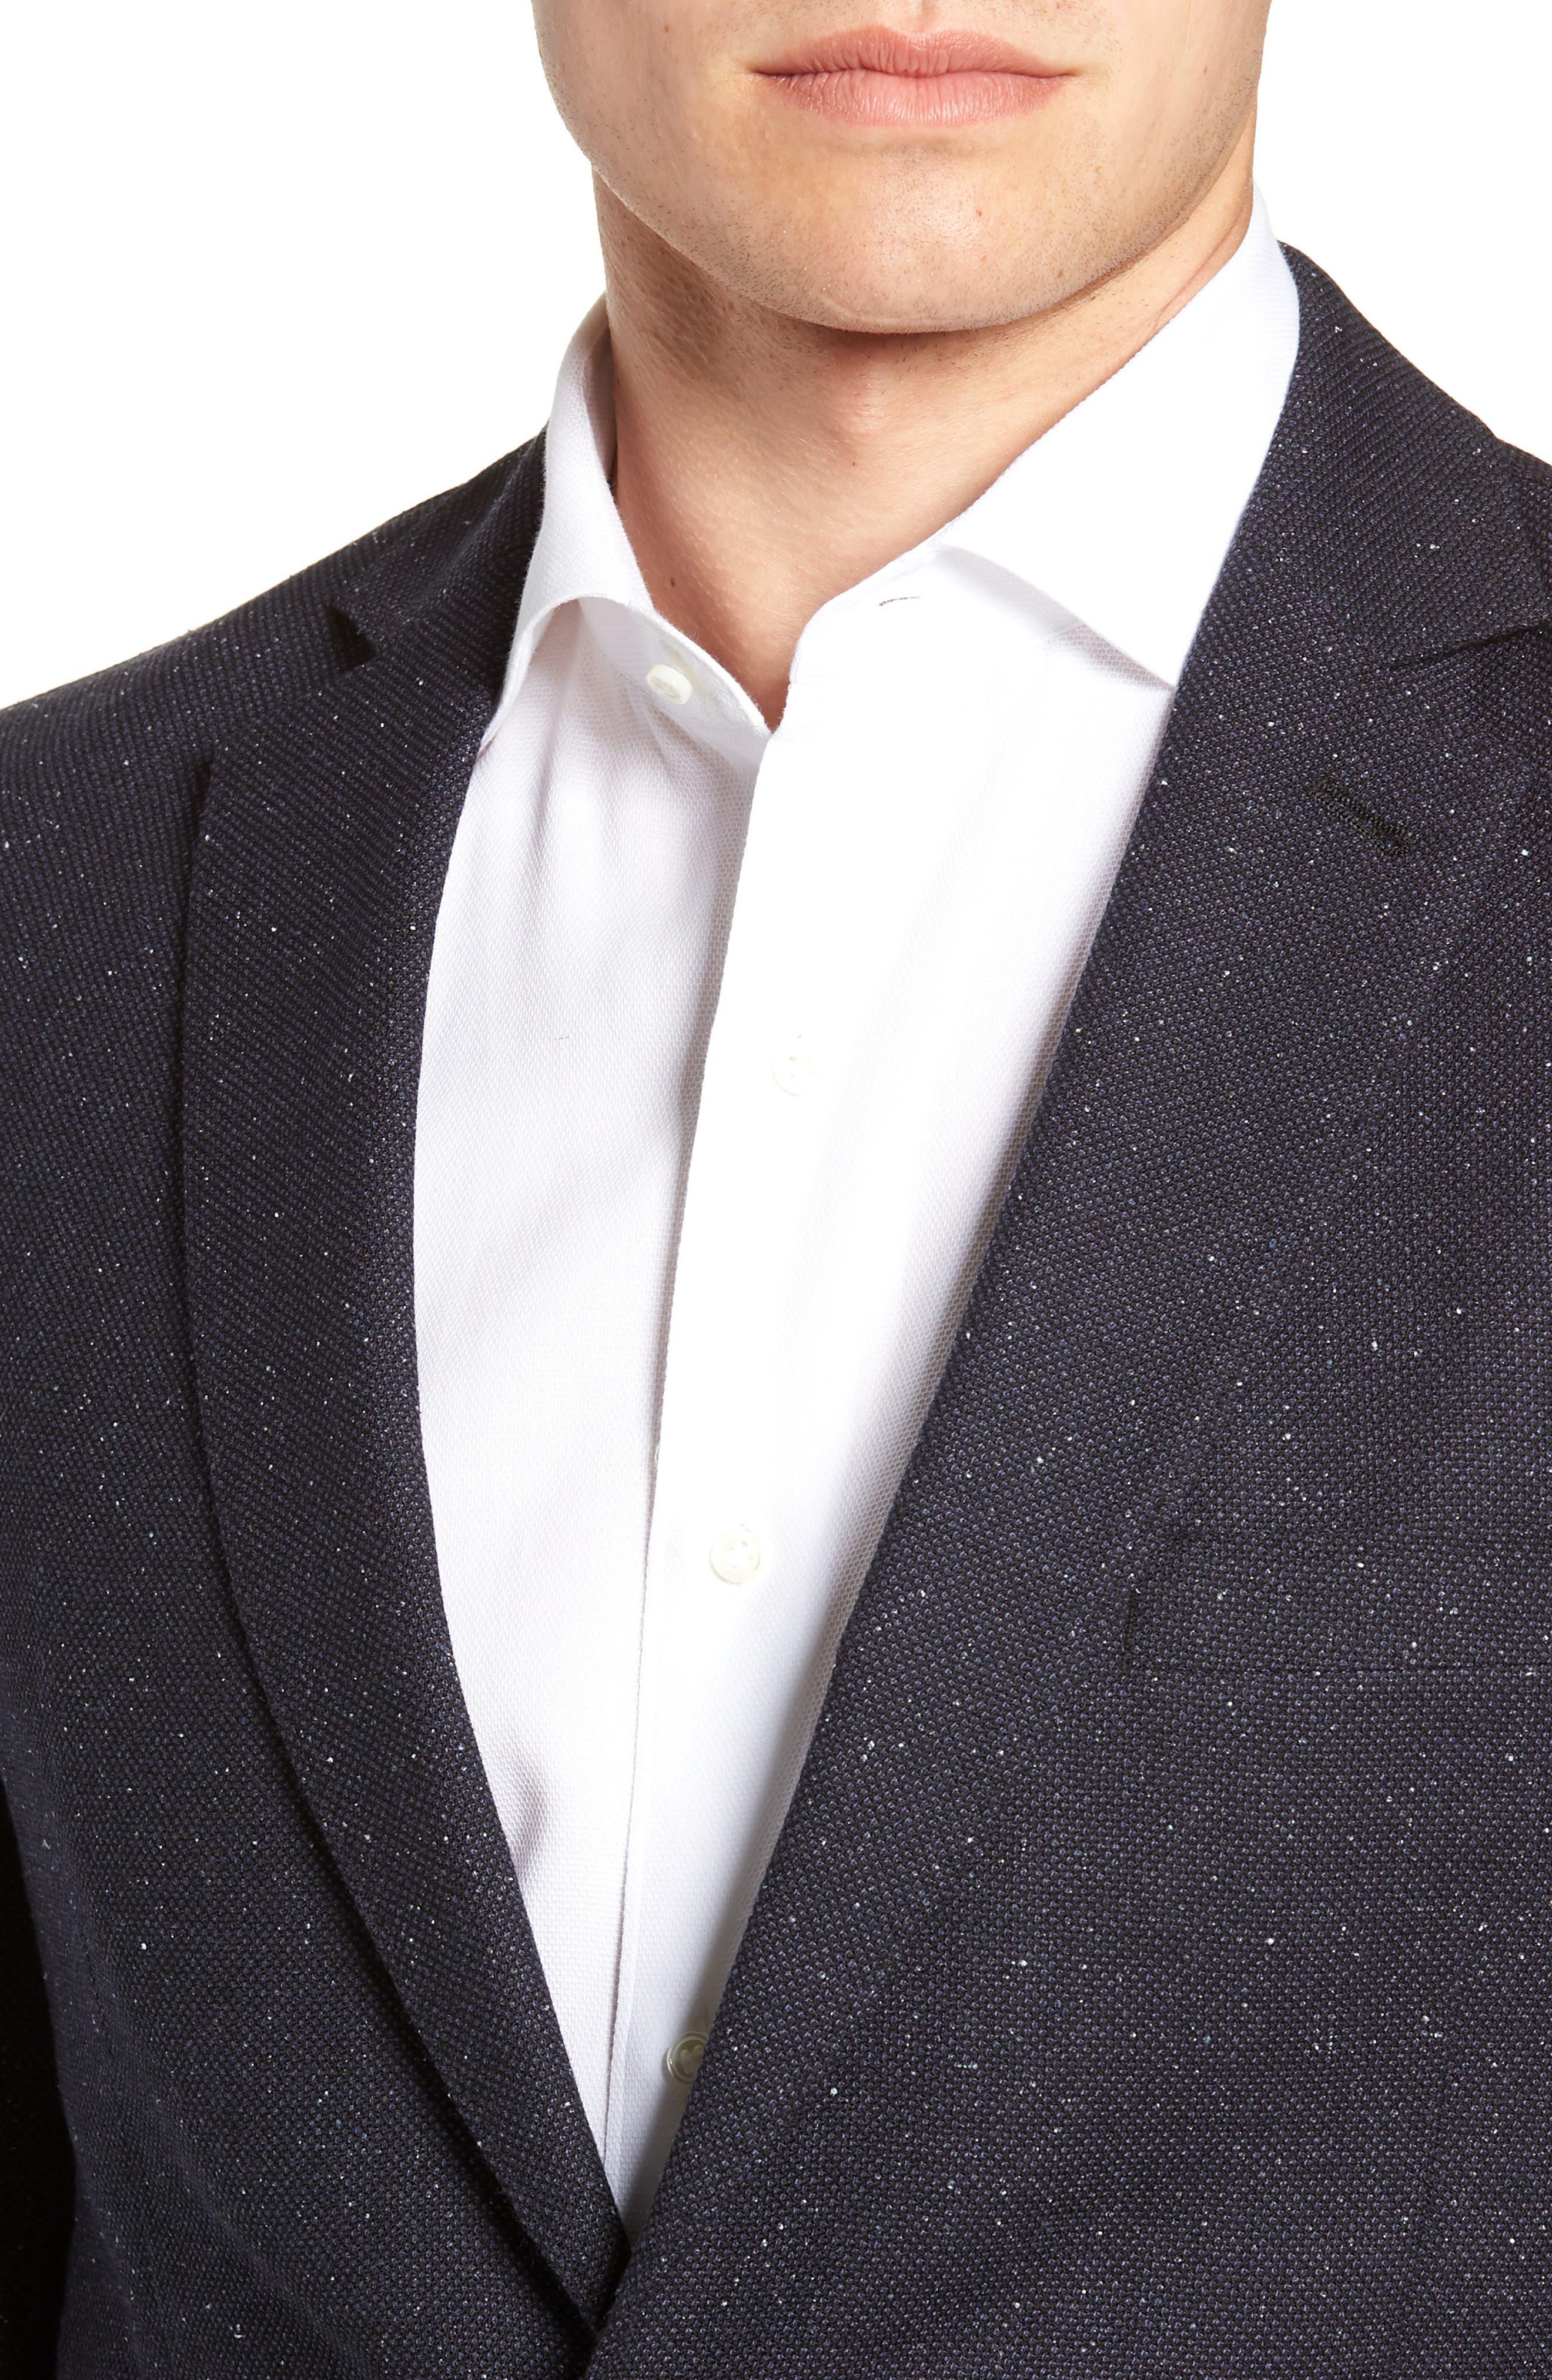 Regular Fit Wool & Silk Blazer,                             Alternate thumbnail 4, color,                             BLUE